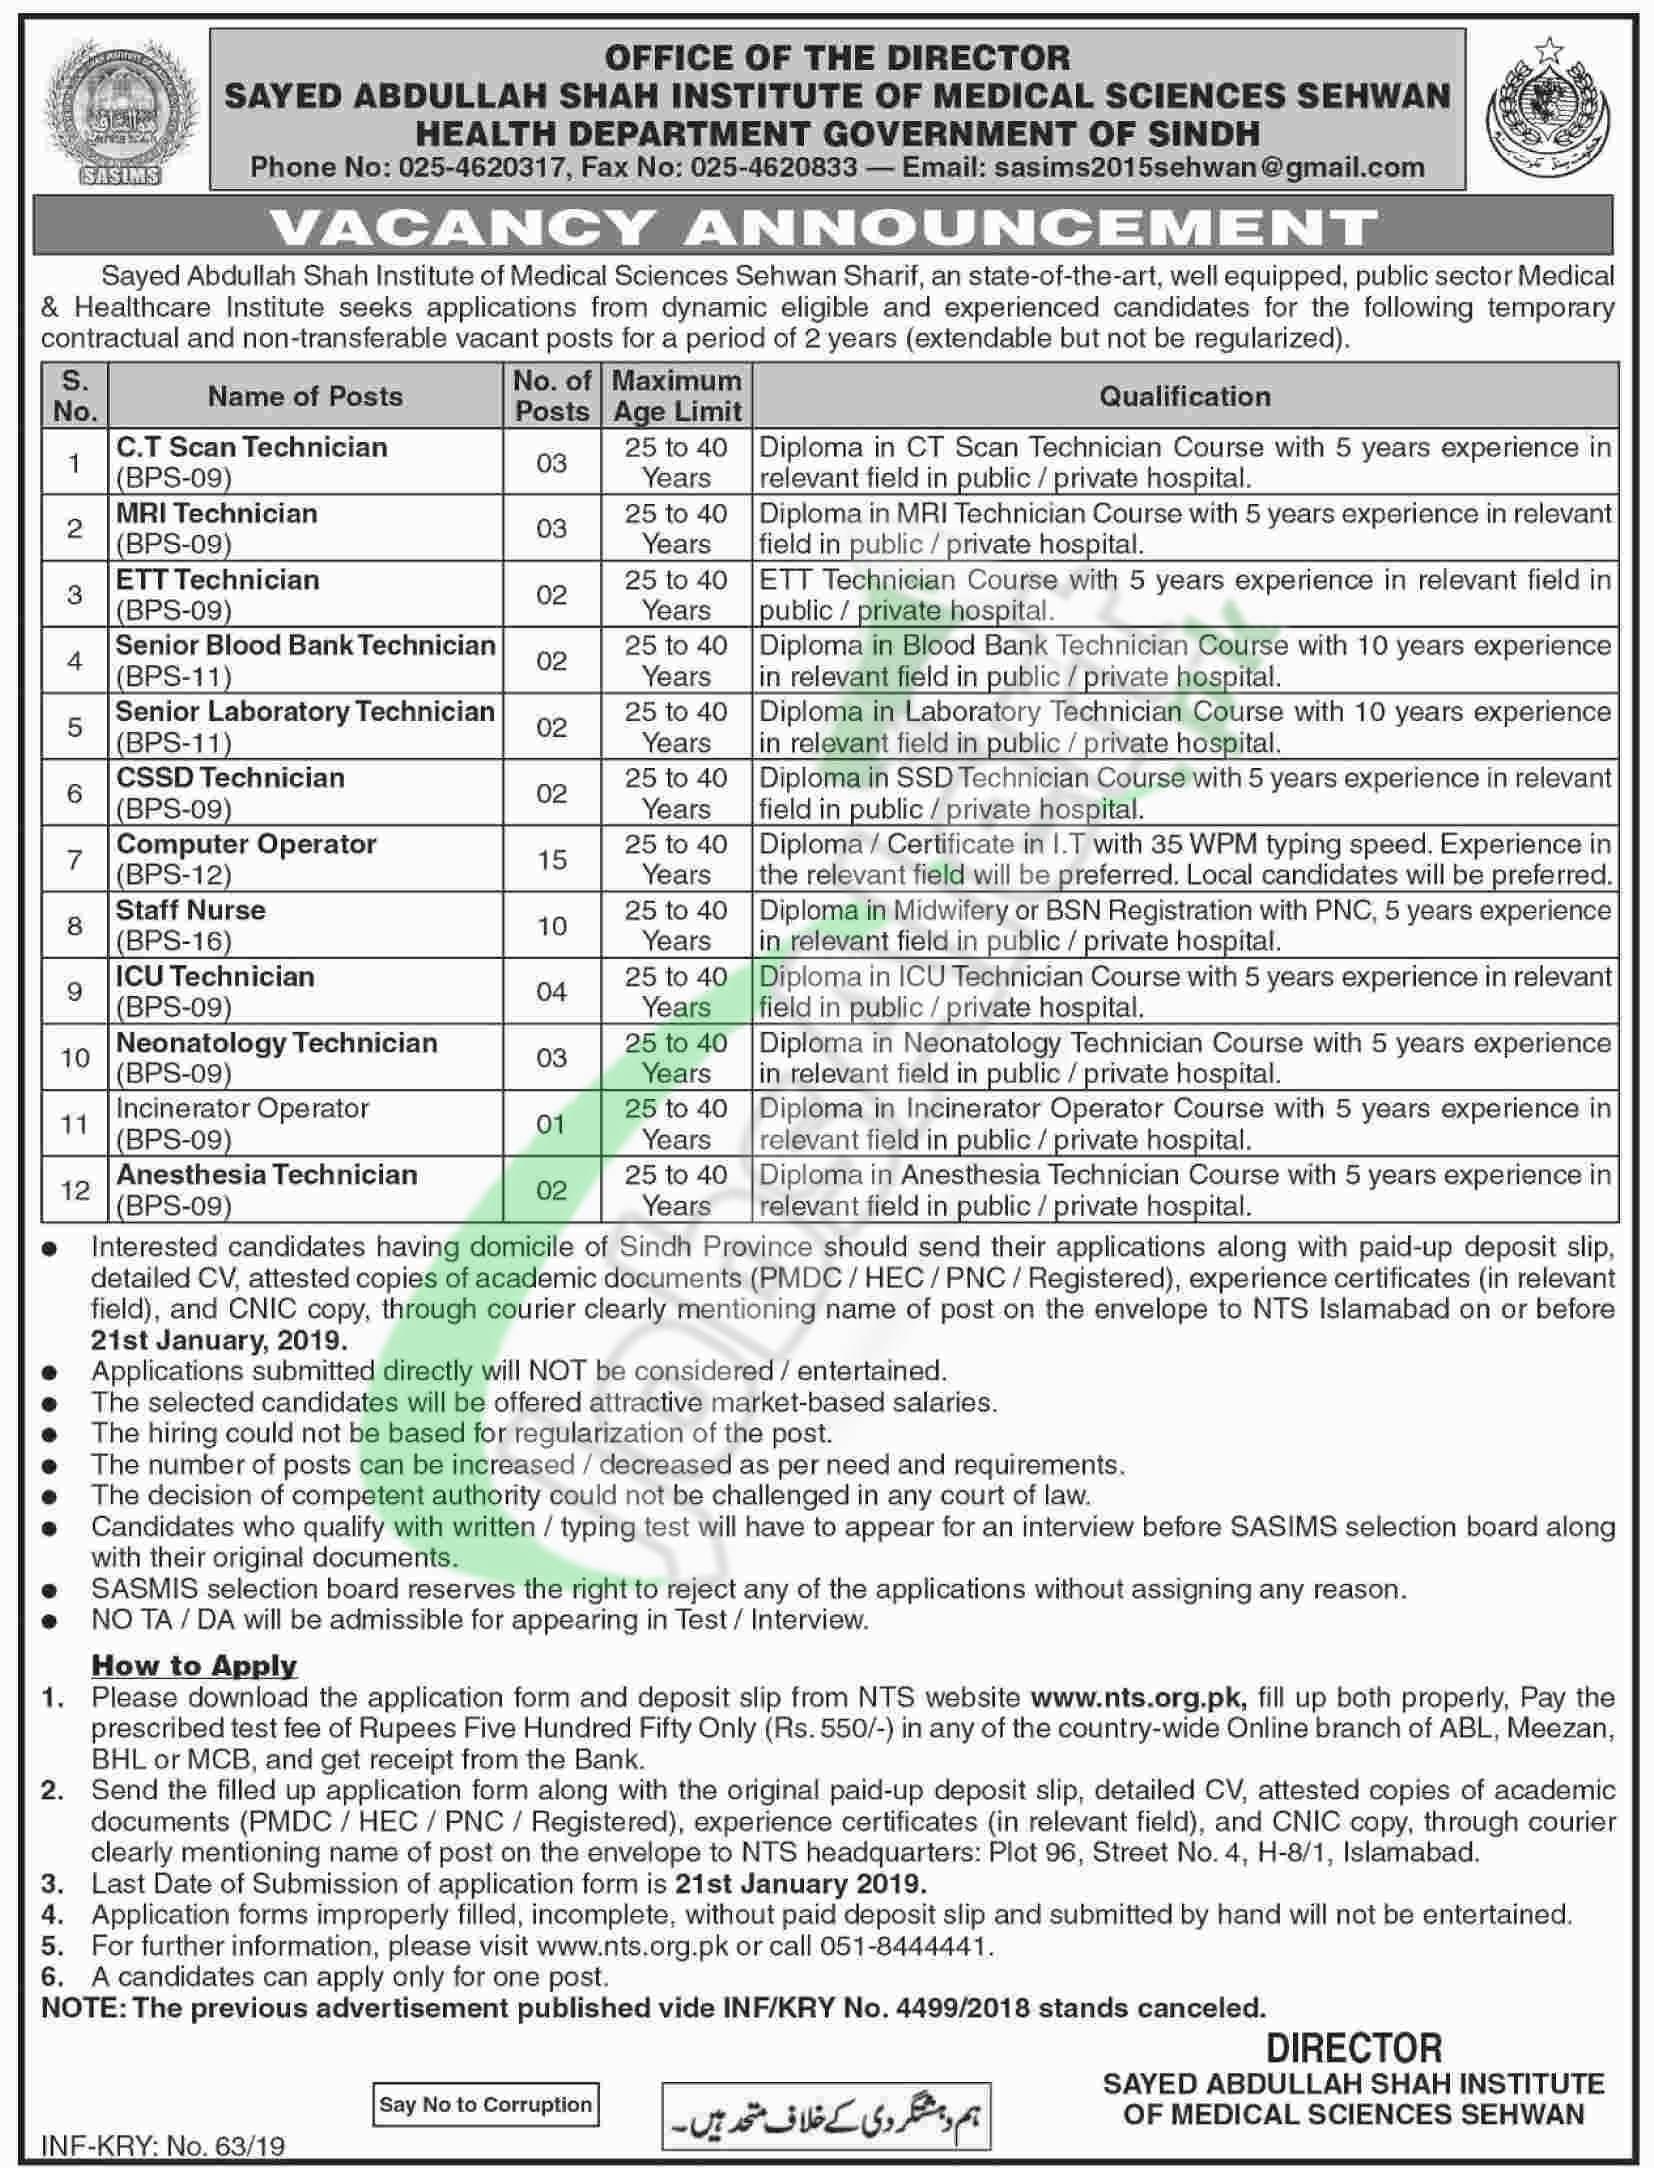 Syed Abdullah Shah Institute of Medical Sciences Sehwan Jobs 2019